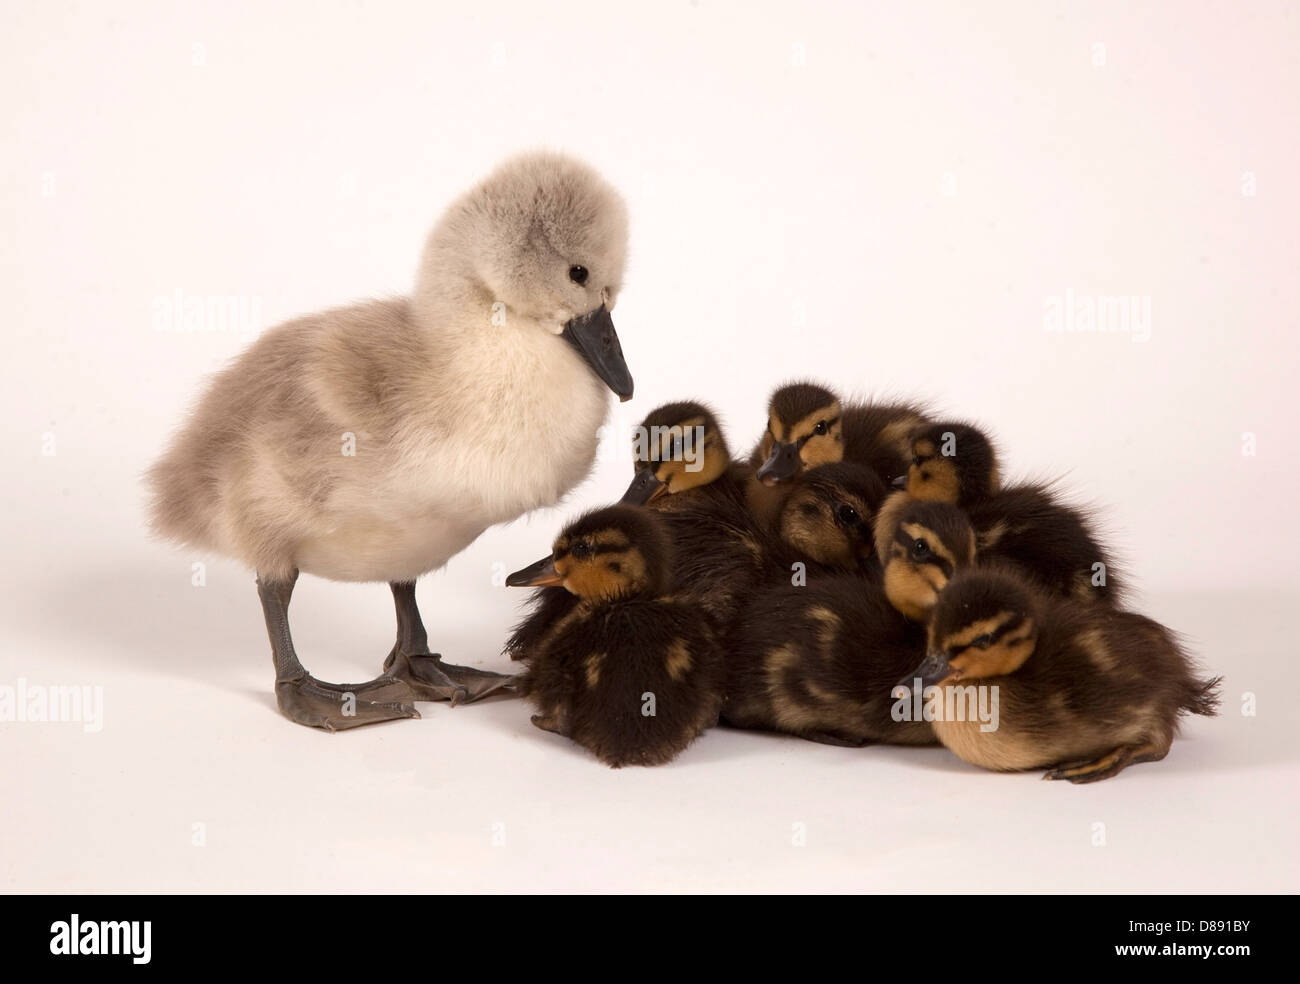 Mute swan cygnet and mallard ducklings in studio - Stock Image